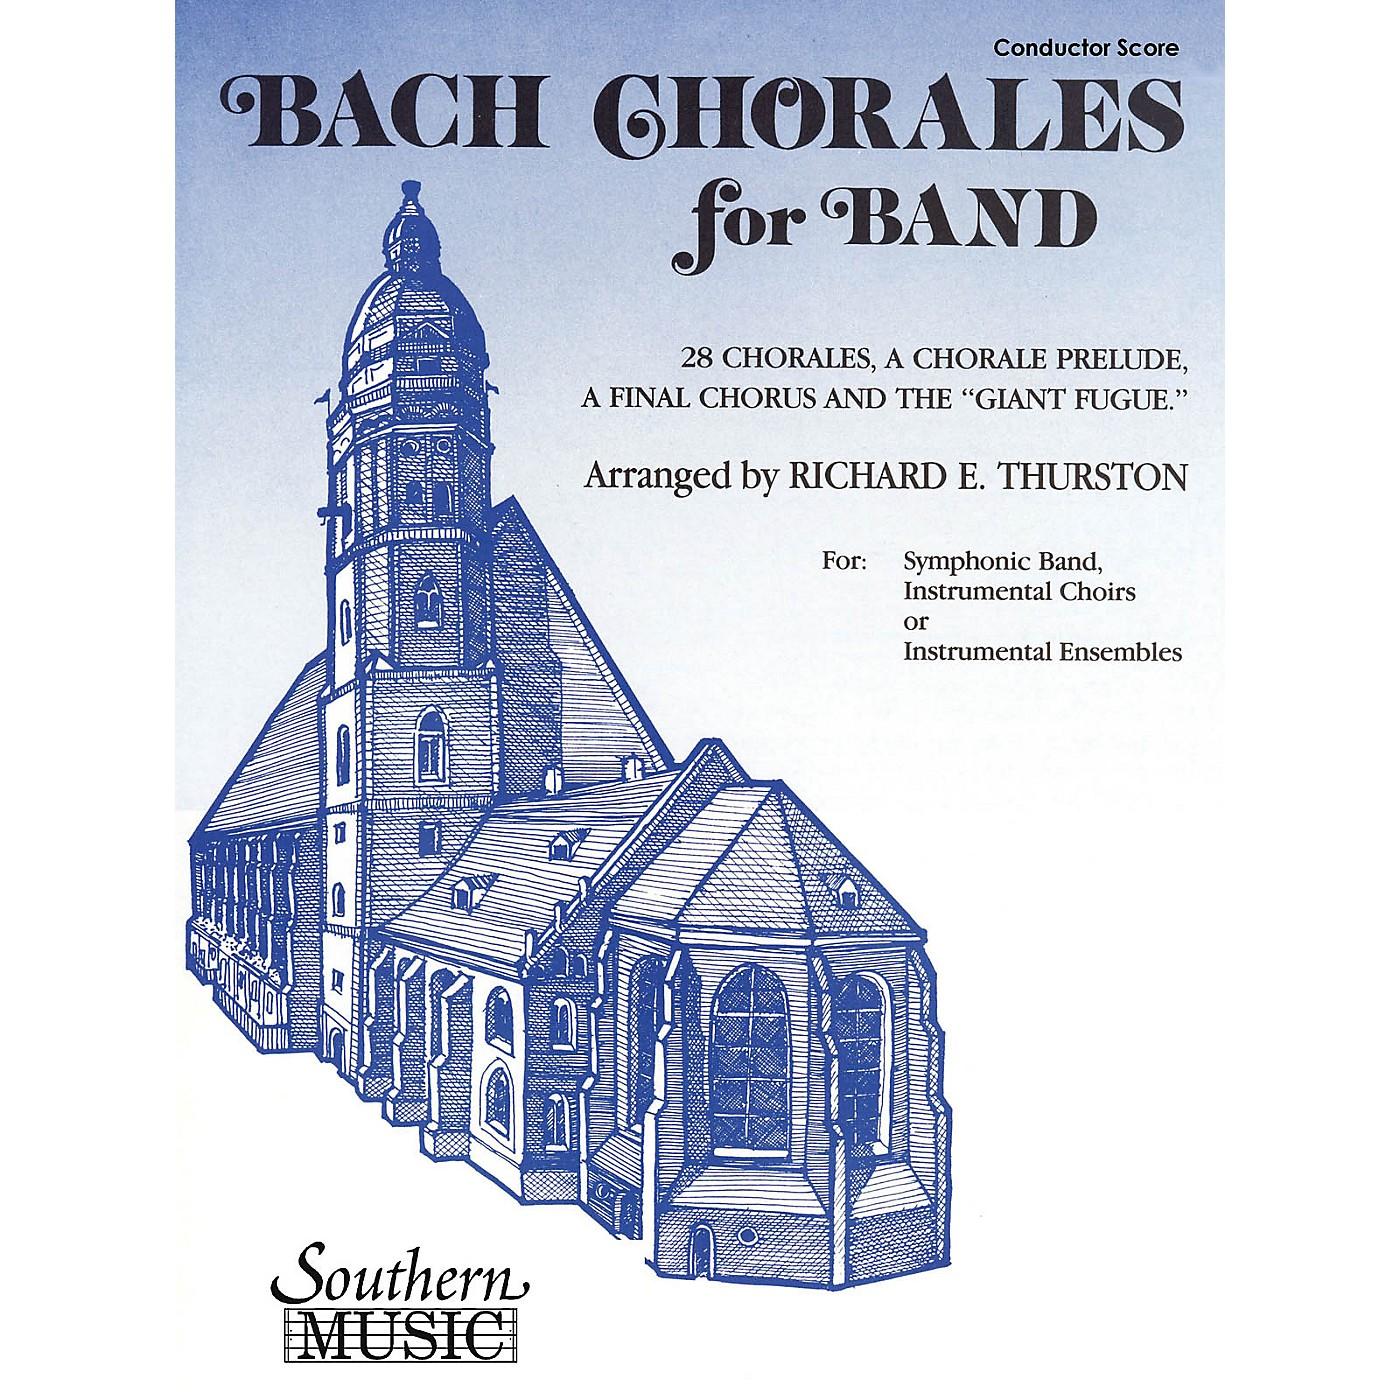 Southern Bach Chorales for Band (E-Flat Baritone Saxophone) Concert Band Level 3 Arranged by Richard E. Thurston thumbnail